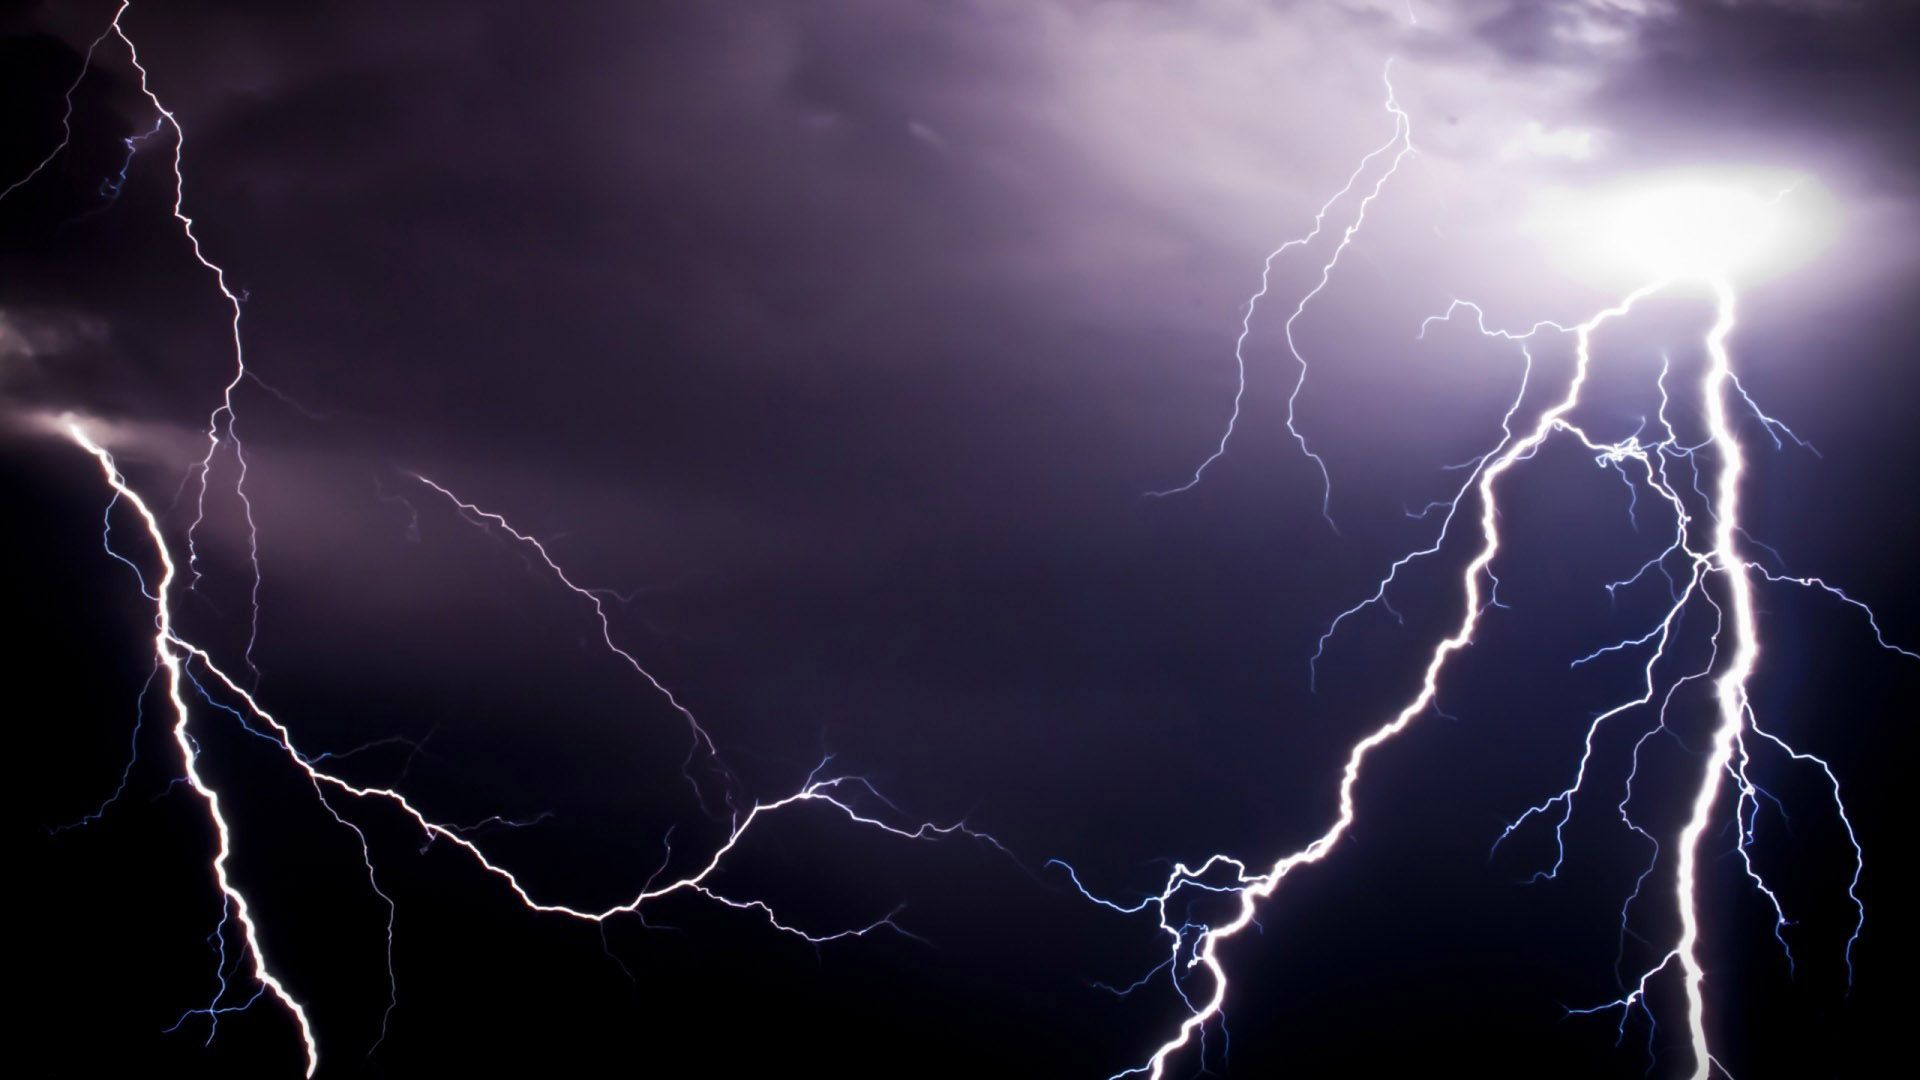 Lightning Wallpapers 1080p Widescreen Wallpaper Hd Wallpaper Black Lightning